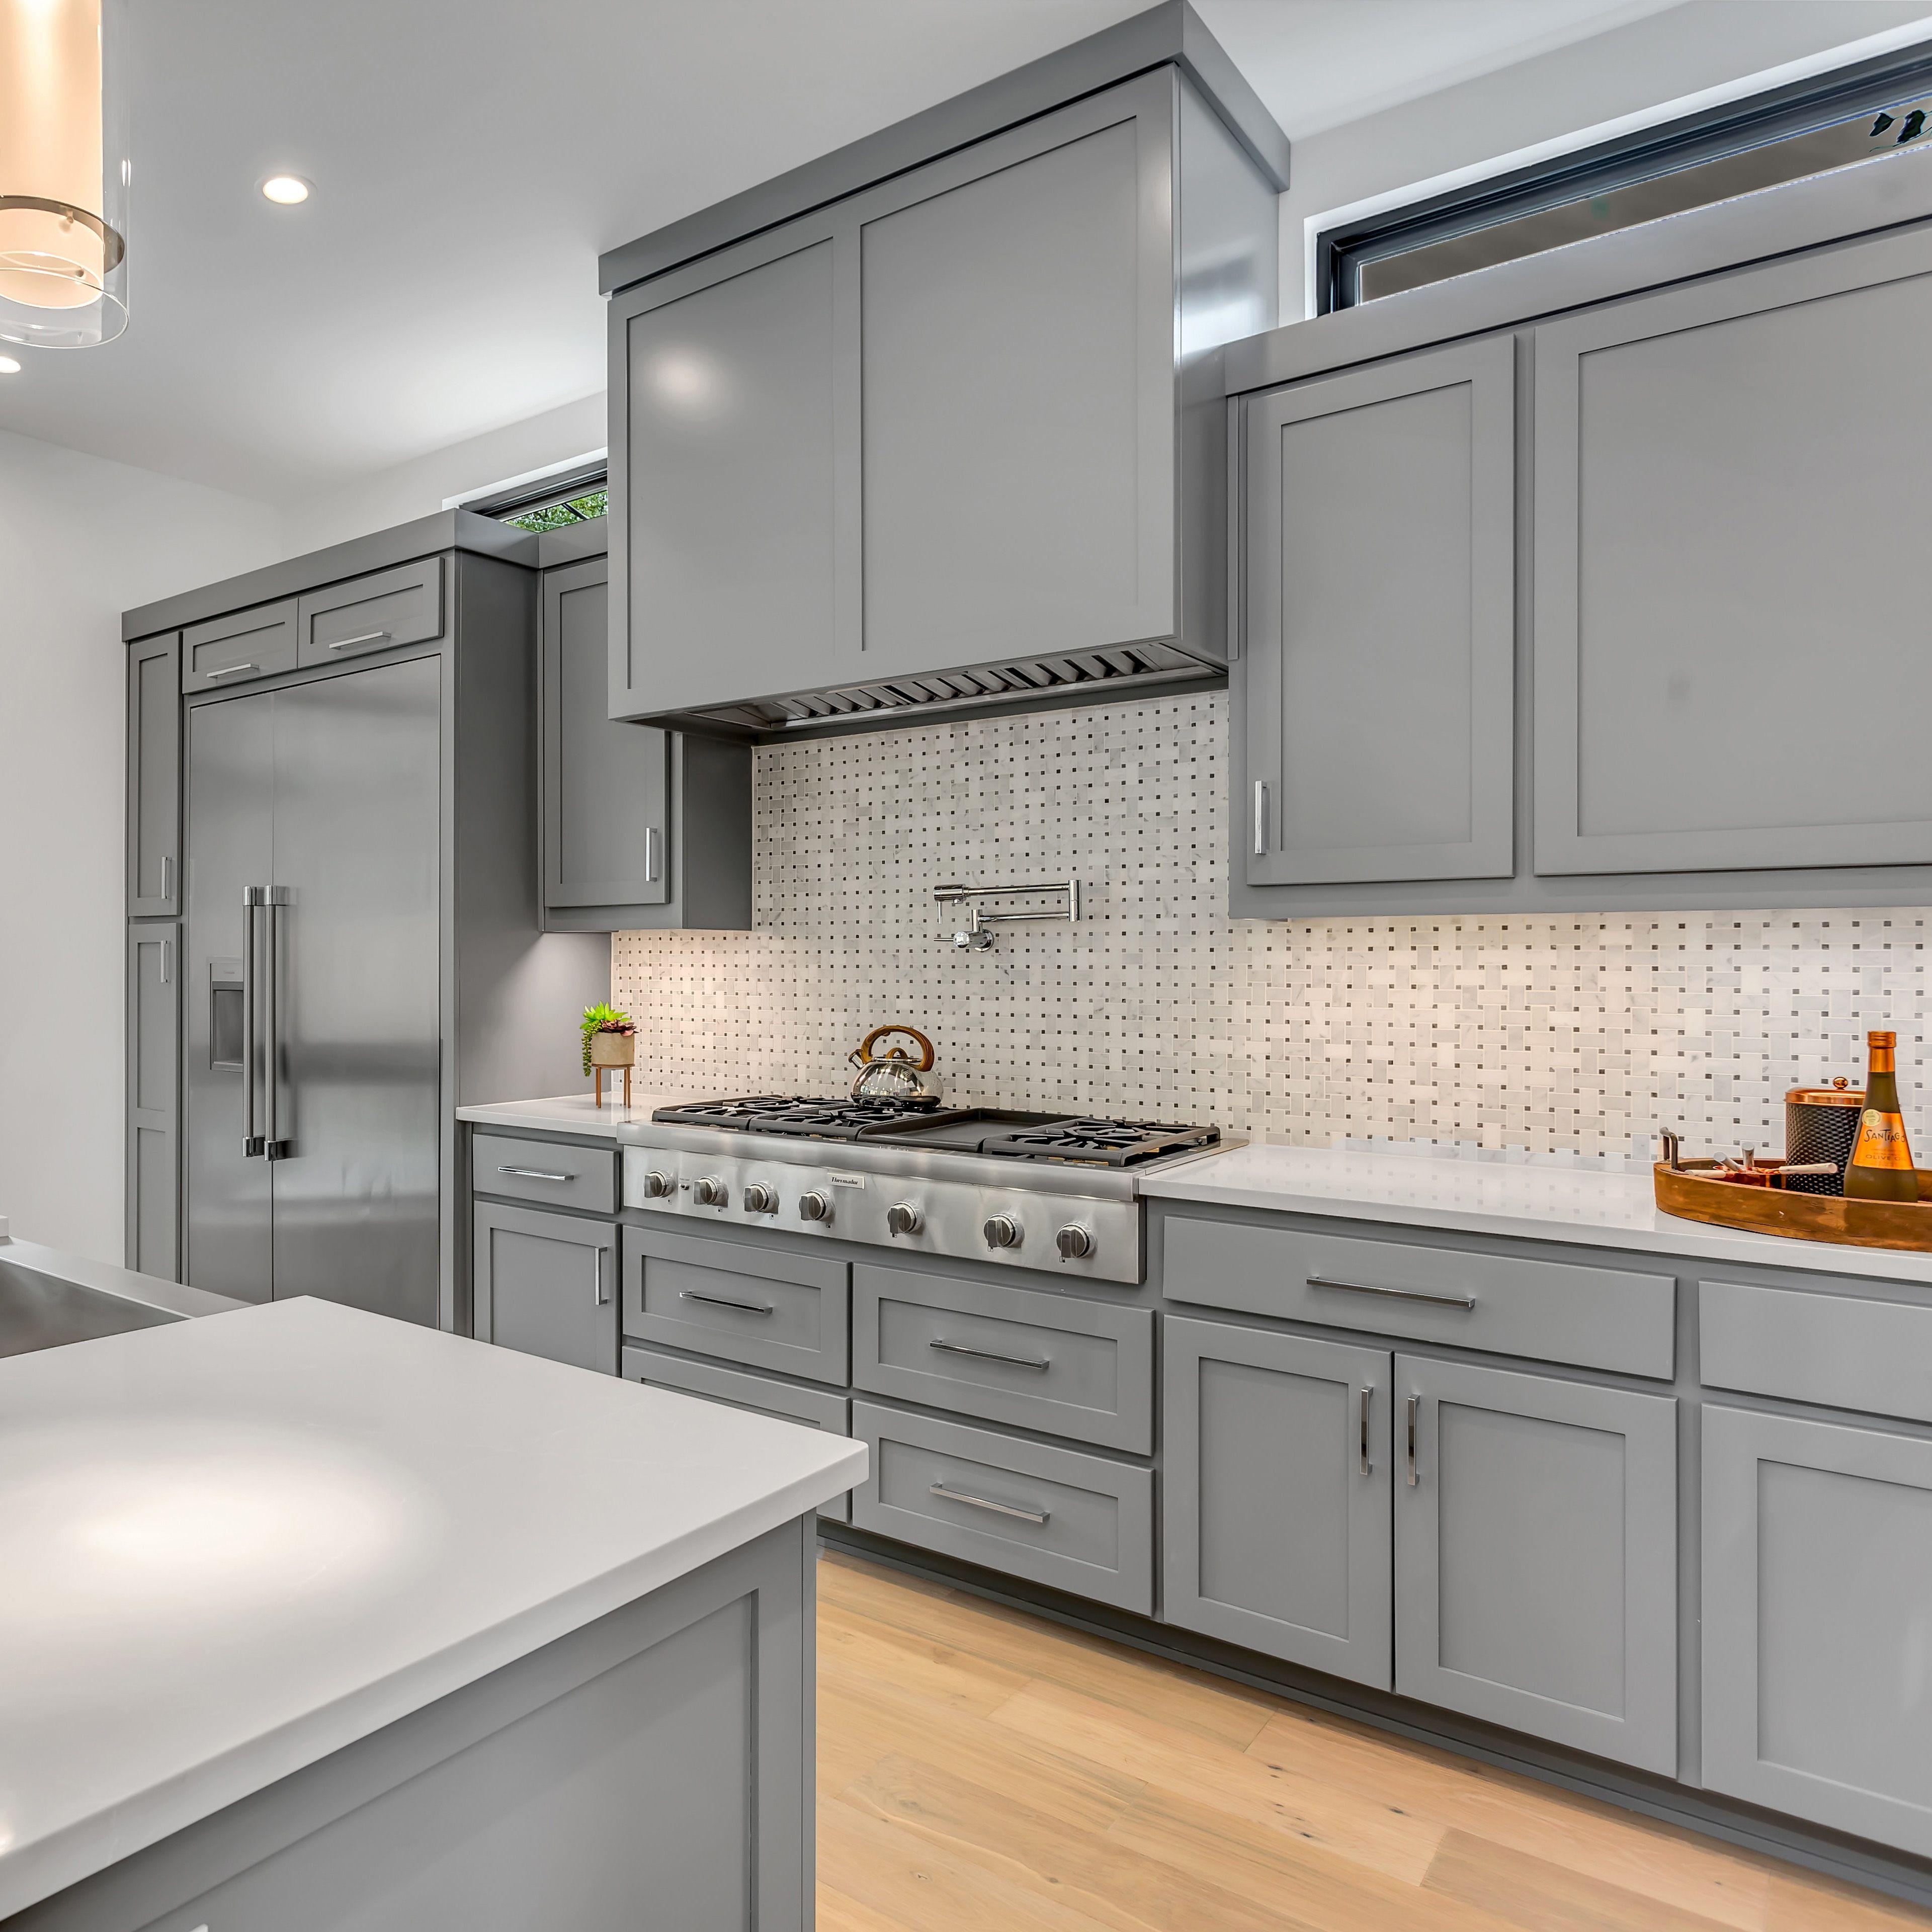 Kitchen Set Minimalis Putih Abu Abu Up To Date Roof Design Accesories